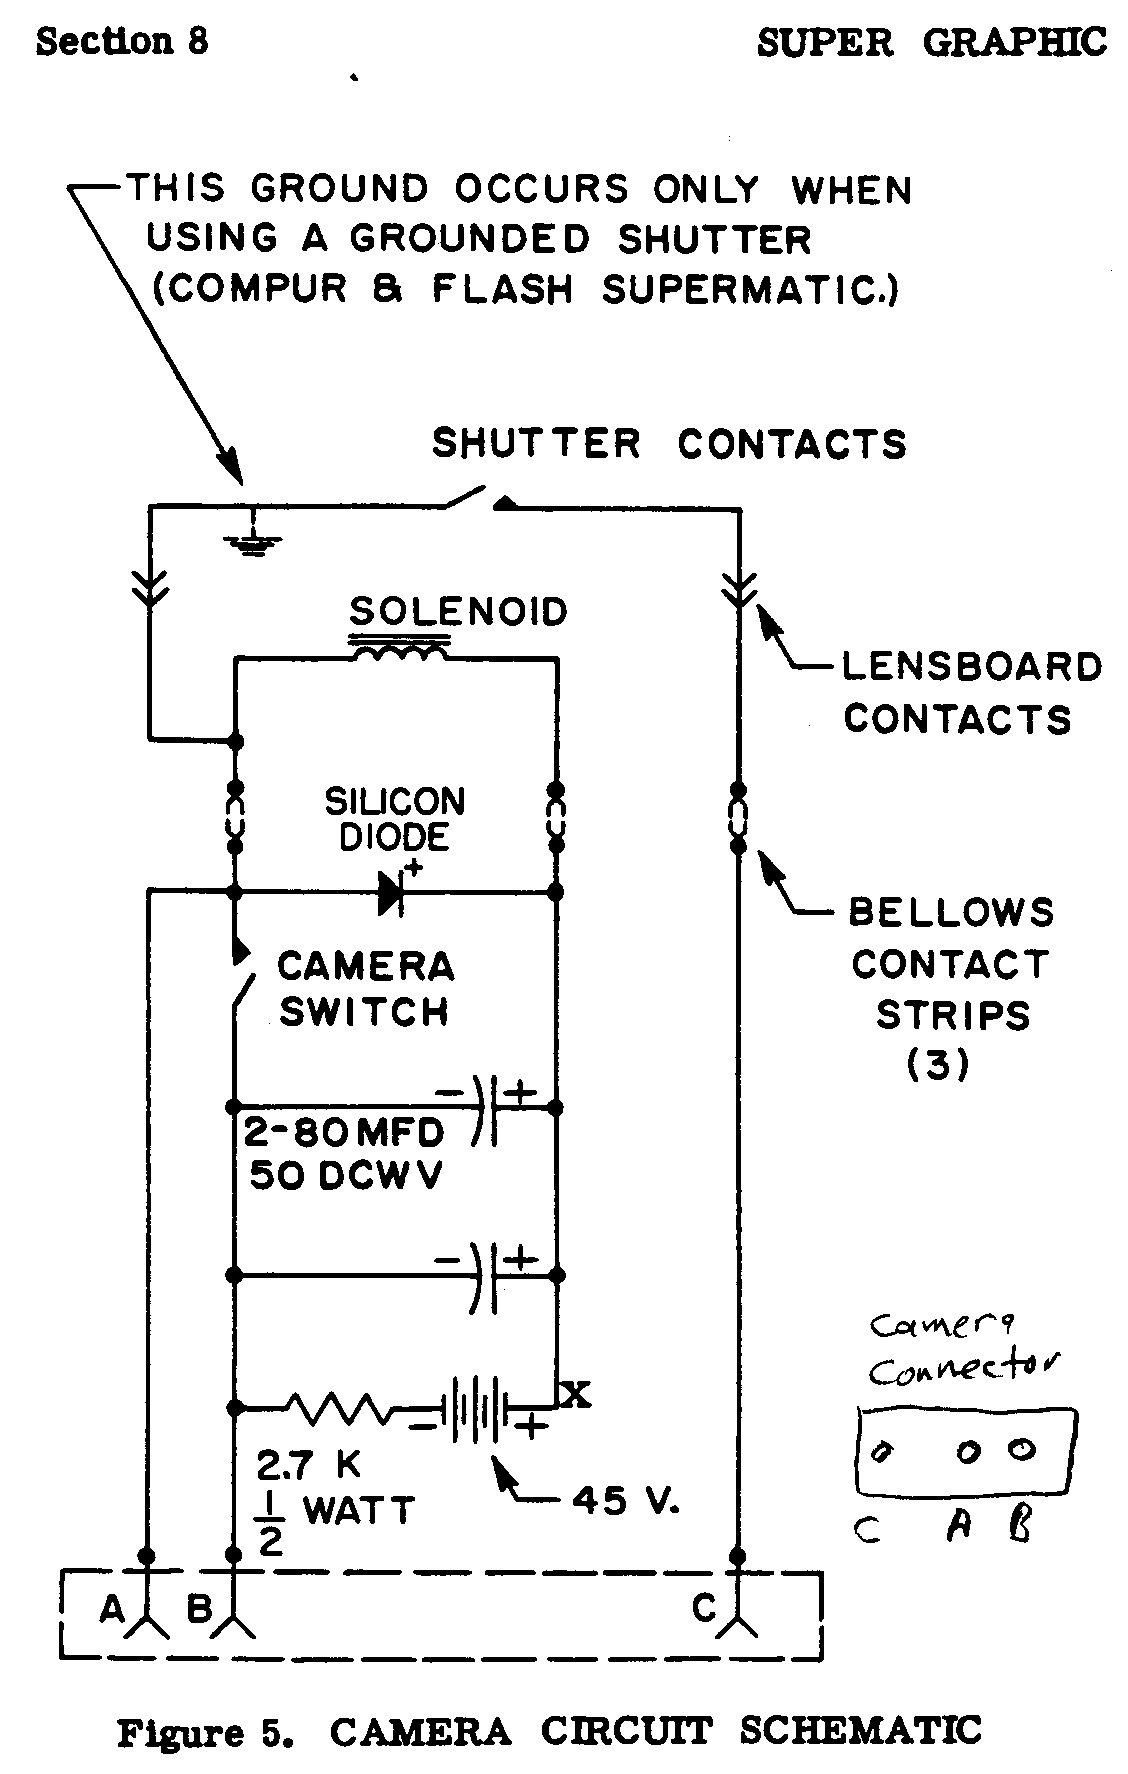 South Bristol Views Graflex Manuals And More 07 02 04 16 True T 23 Wiring Diagram Super Graphic